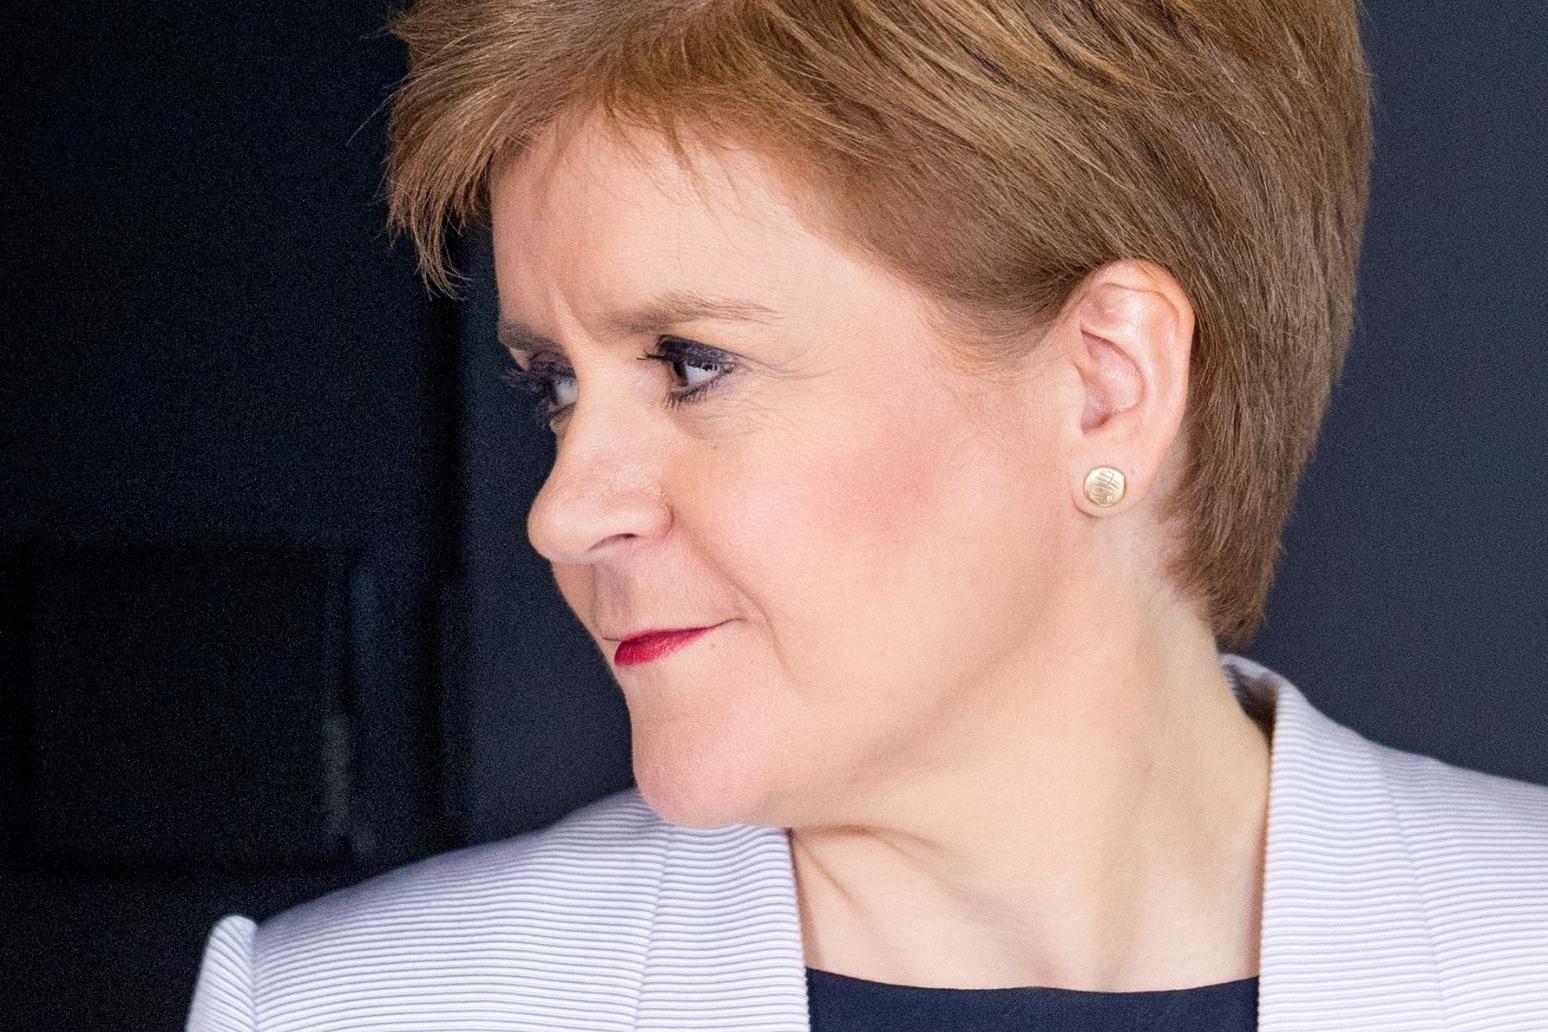 Glasgow drops to Level 2 as coronavirus restrictions ease across Scotland